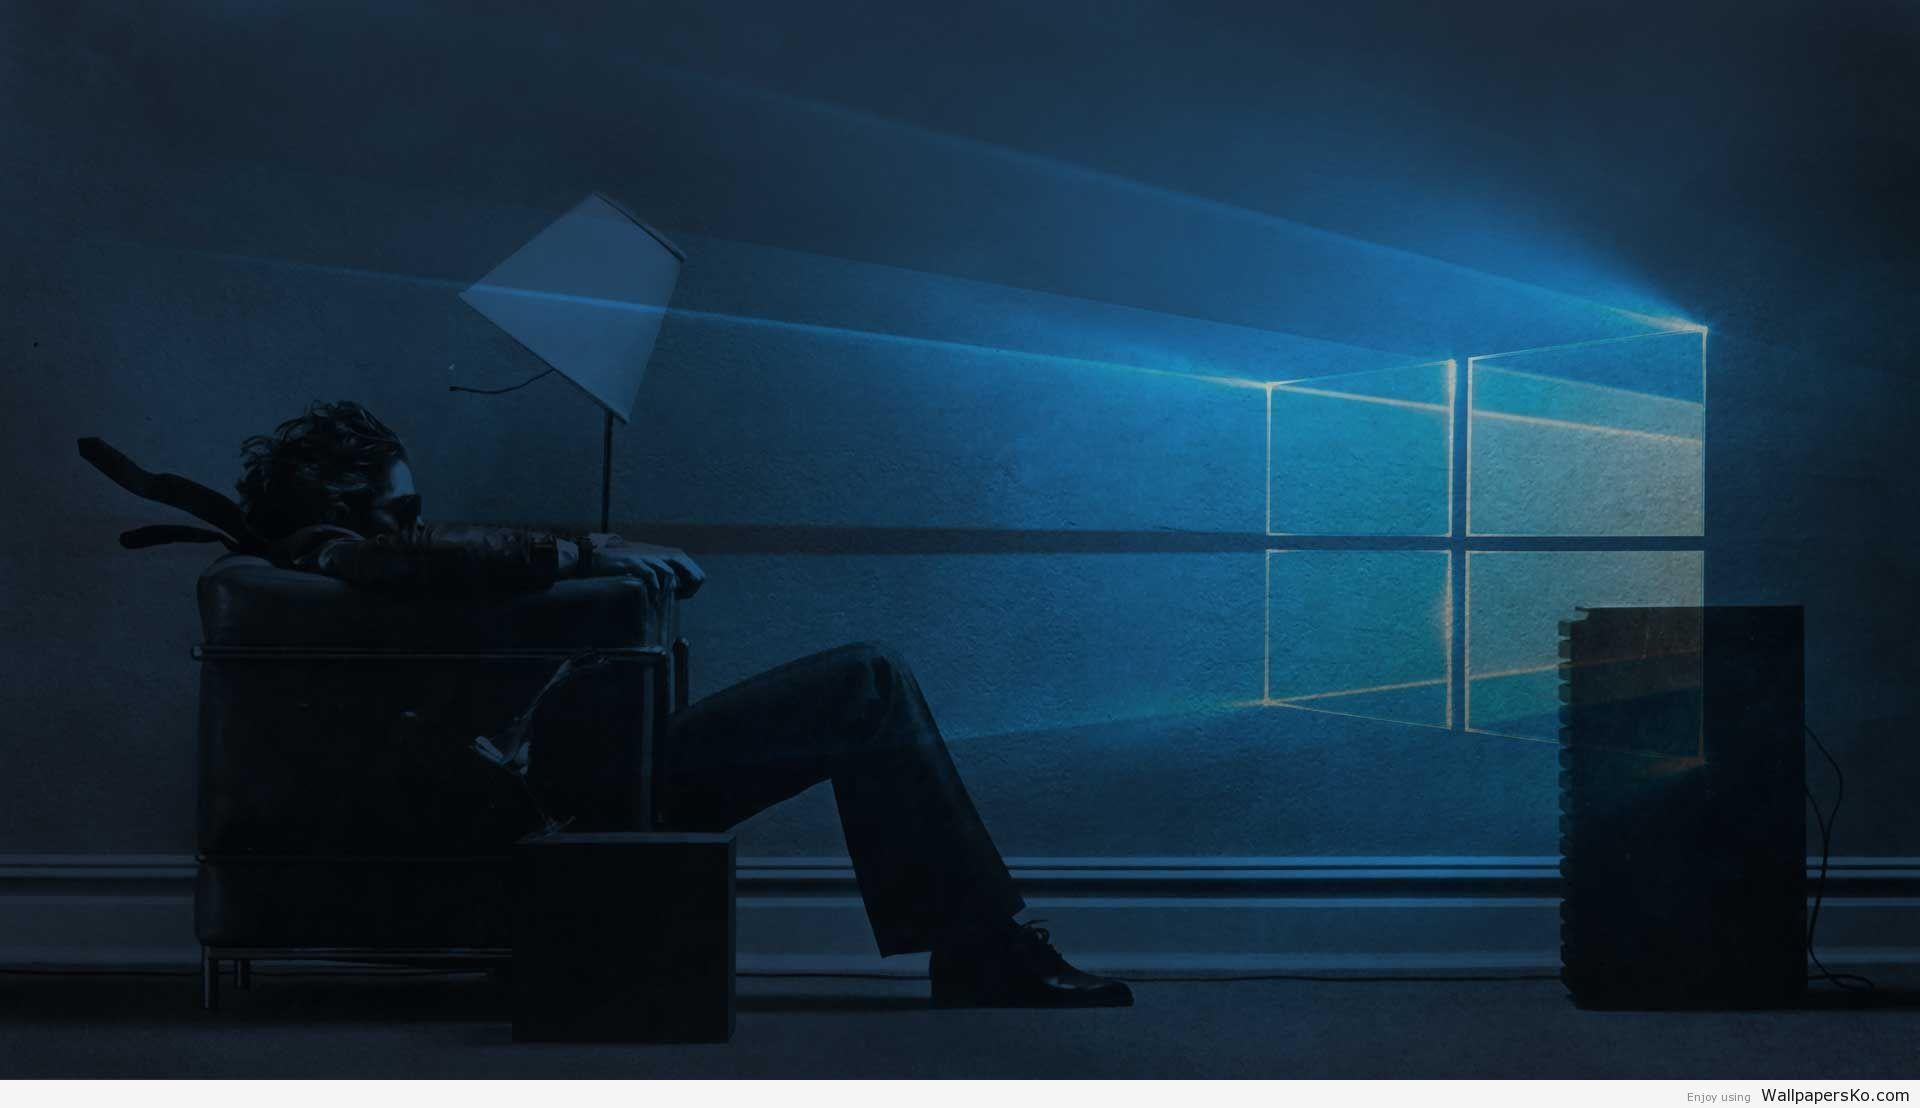 Windows 10 Wallpaper 4k Http Wallpapersko Com Windows 10 Wallpaper 4k Html Hd Wallpapers Download Art Wallpaper Hd Wallpaper Beautiful Wallpaper Images